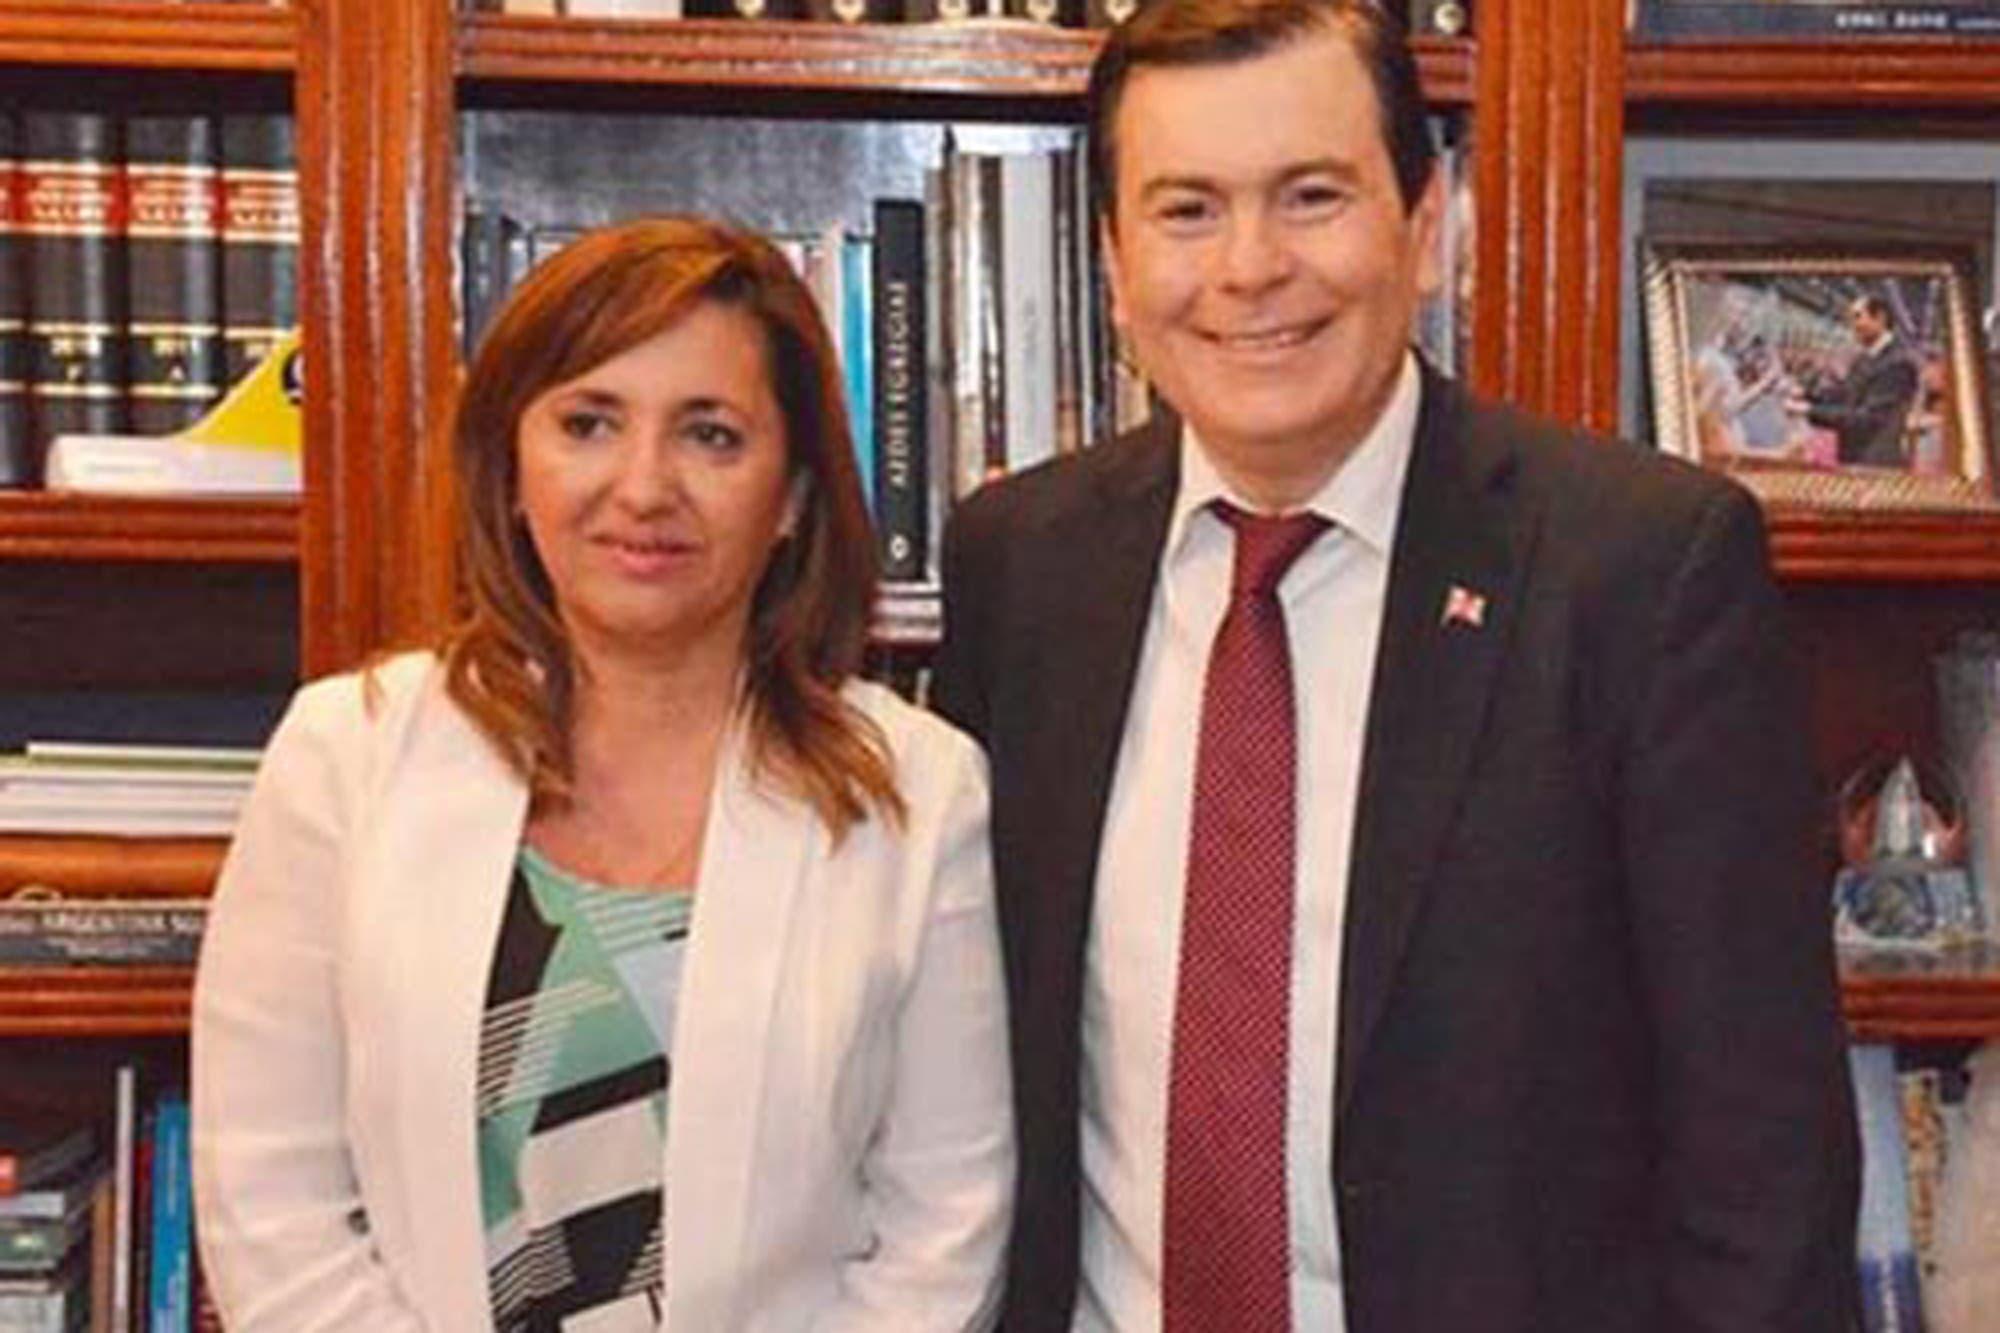 El gobernador Gerardo Zamora pidió un gran frente opositor a Macri para 2019